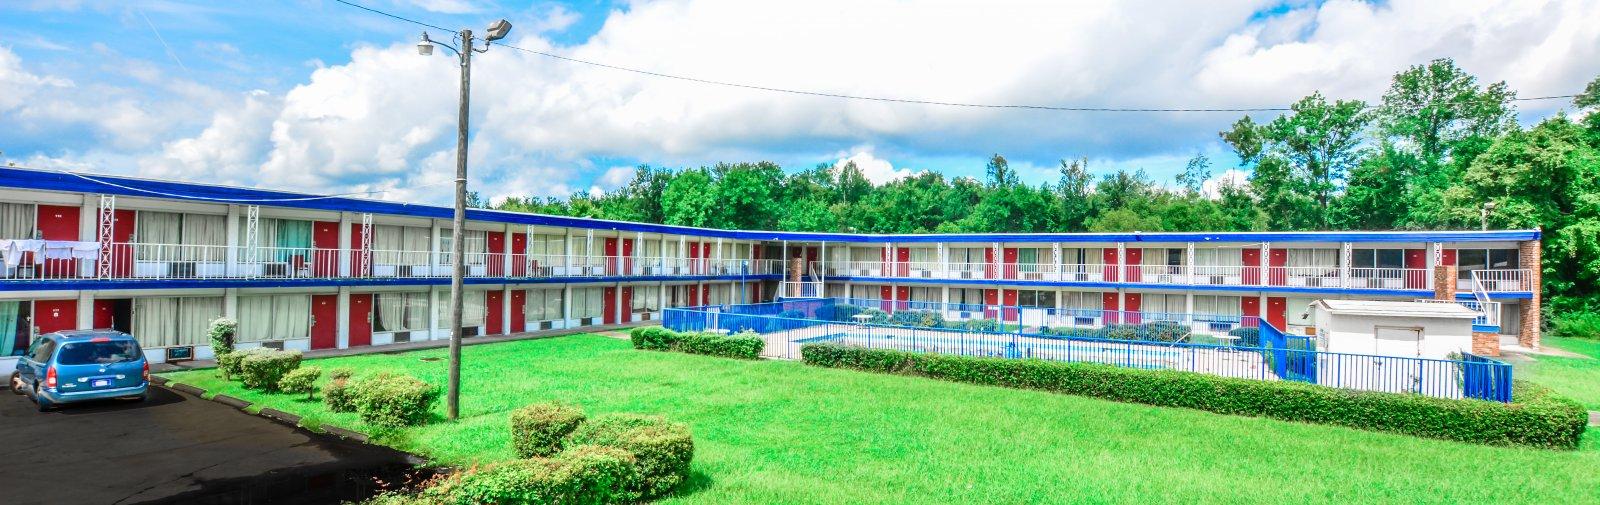 Economy Hotel Macon